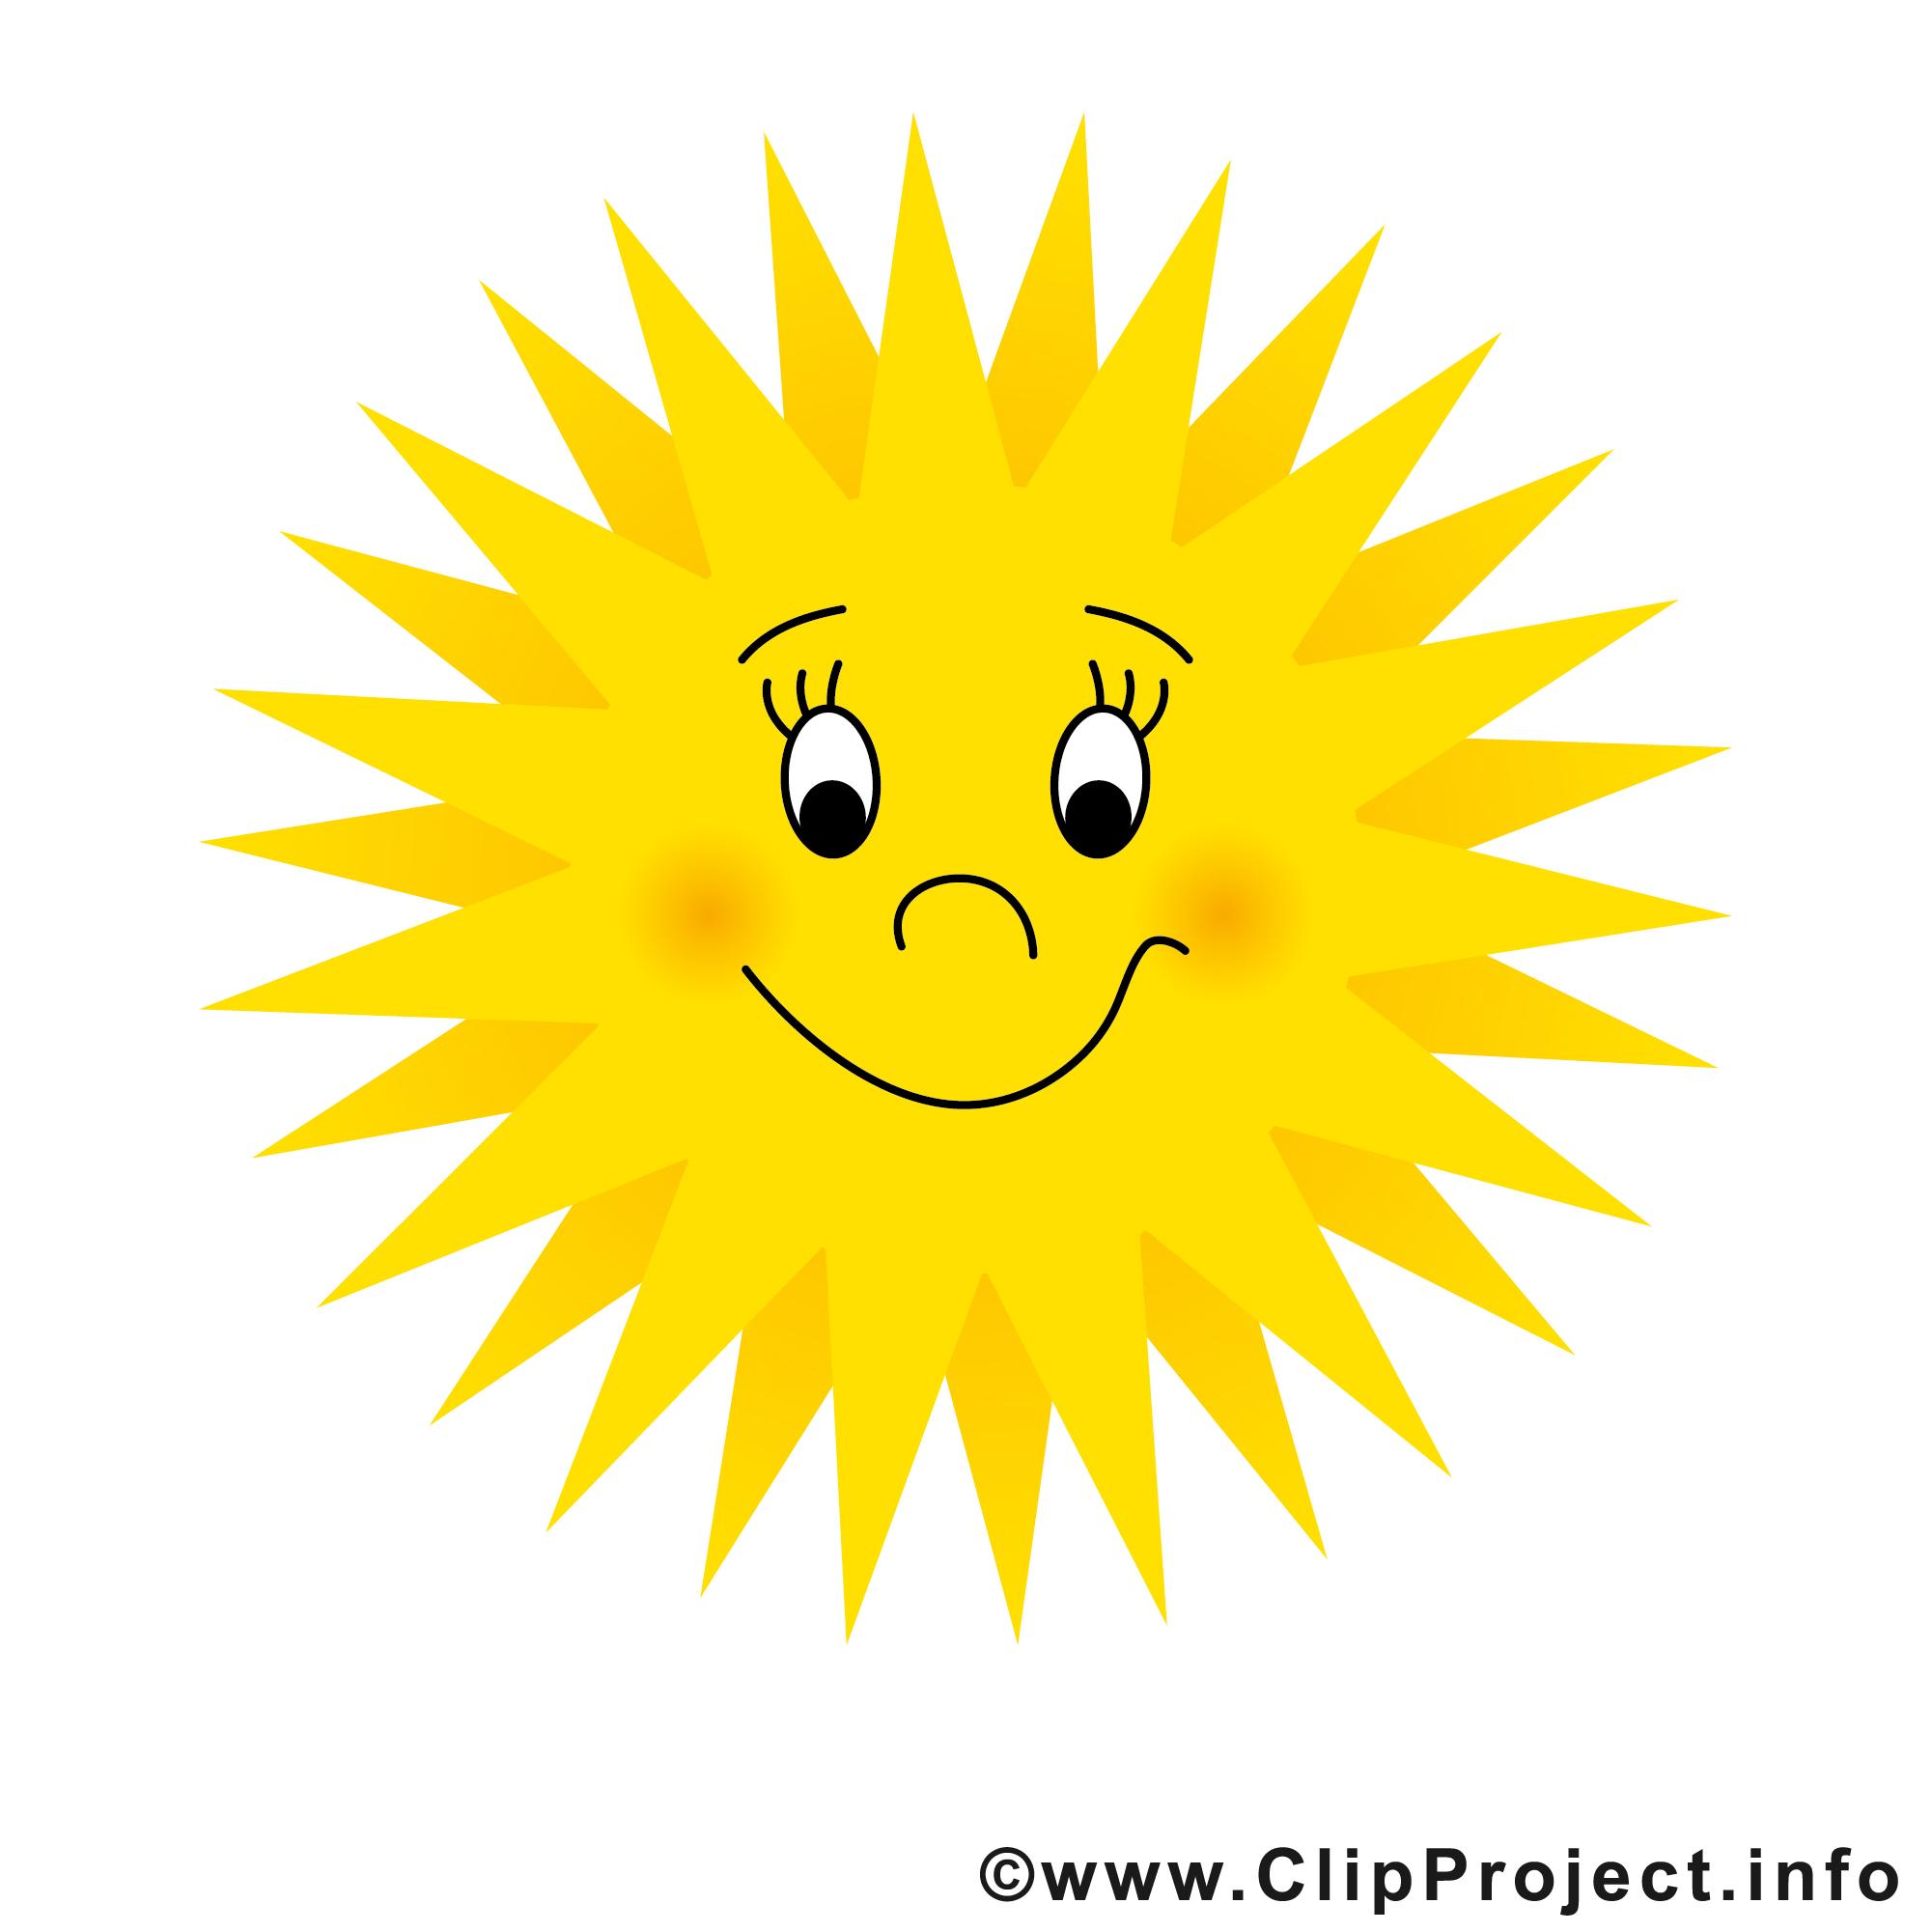 Image soleil gratuite t clipart t dessin picture - Dessin avec emoticone ...